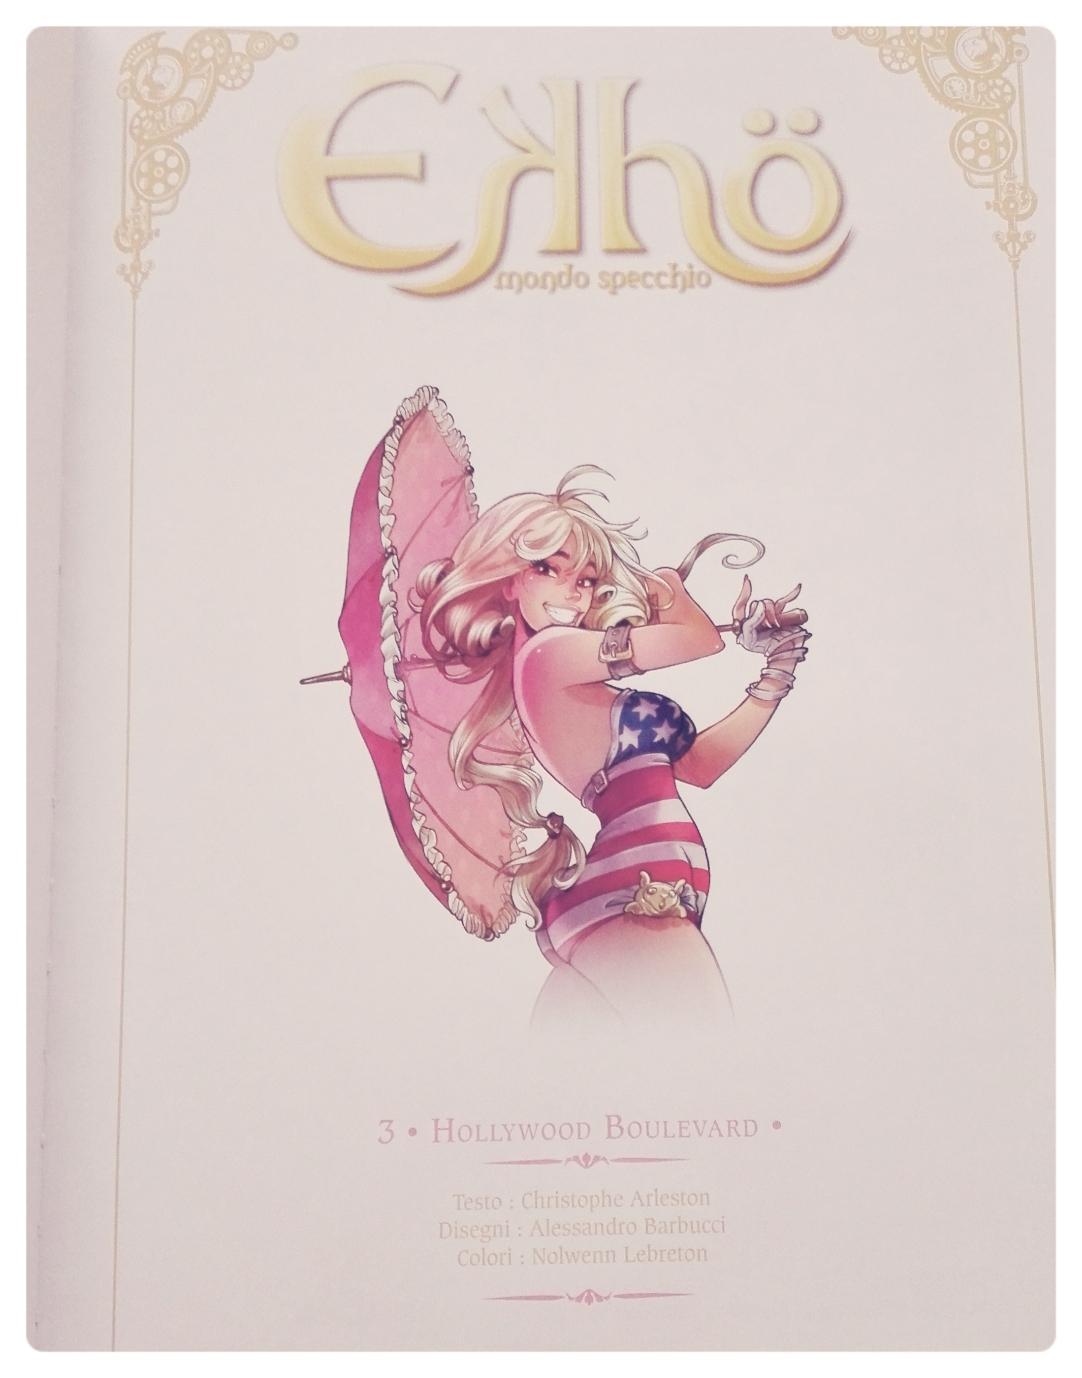 ekho mondo specchio  Romance e non solo: Recensione: Ekho. Mondo specchio Hollywood ...